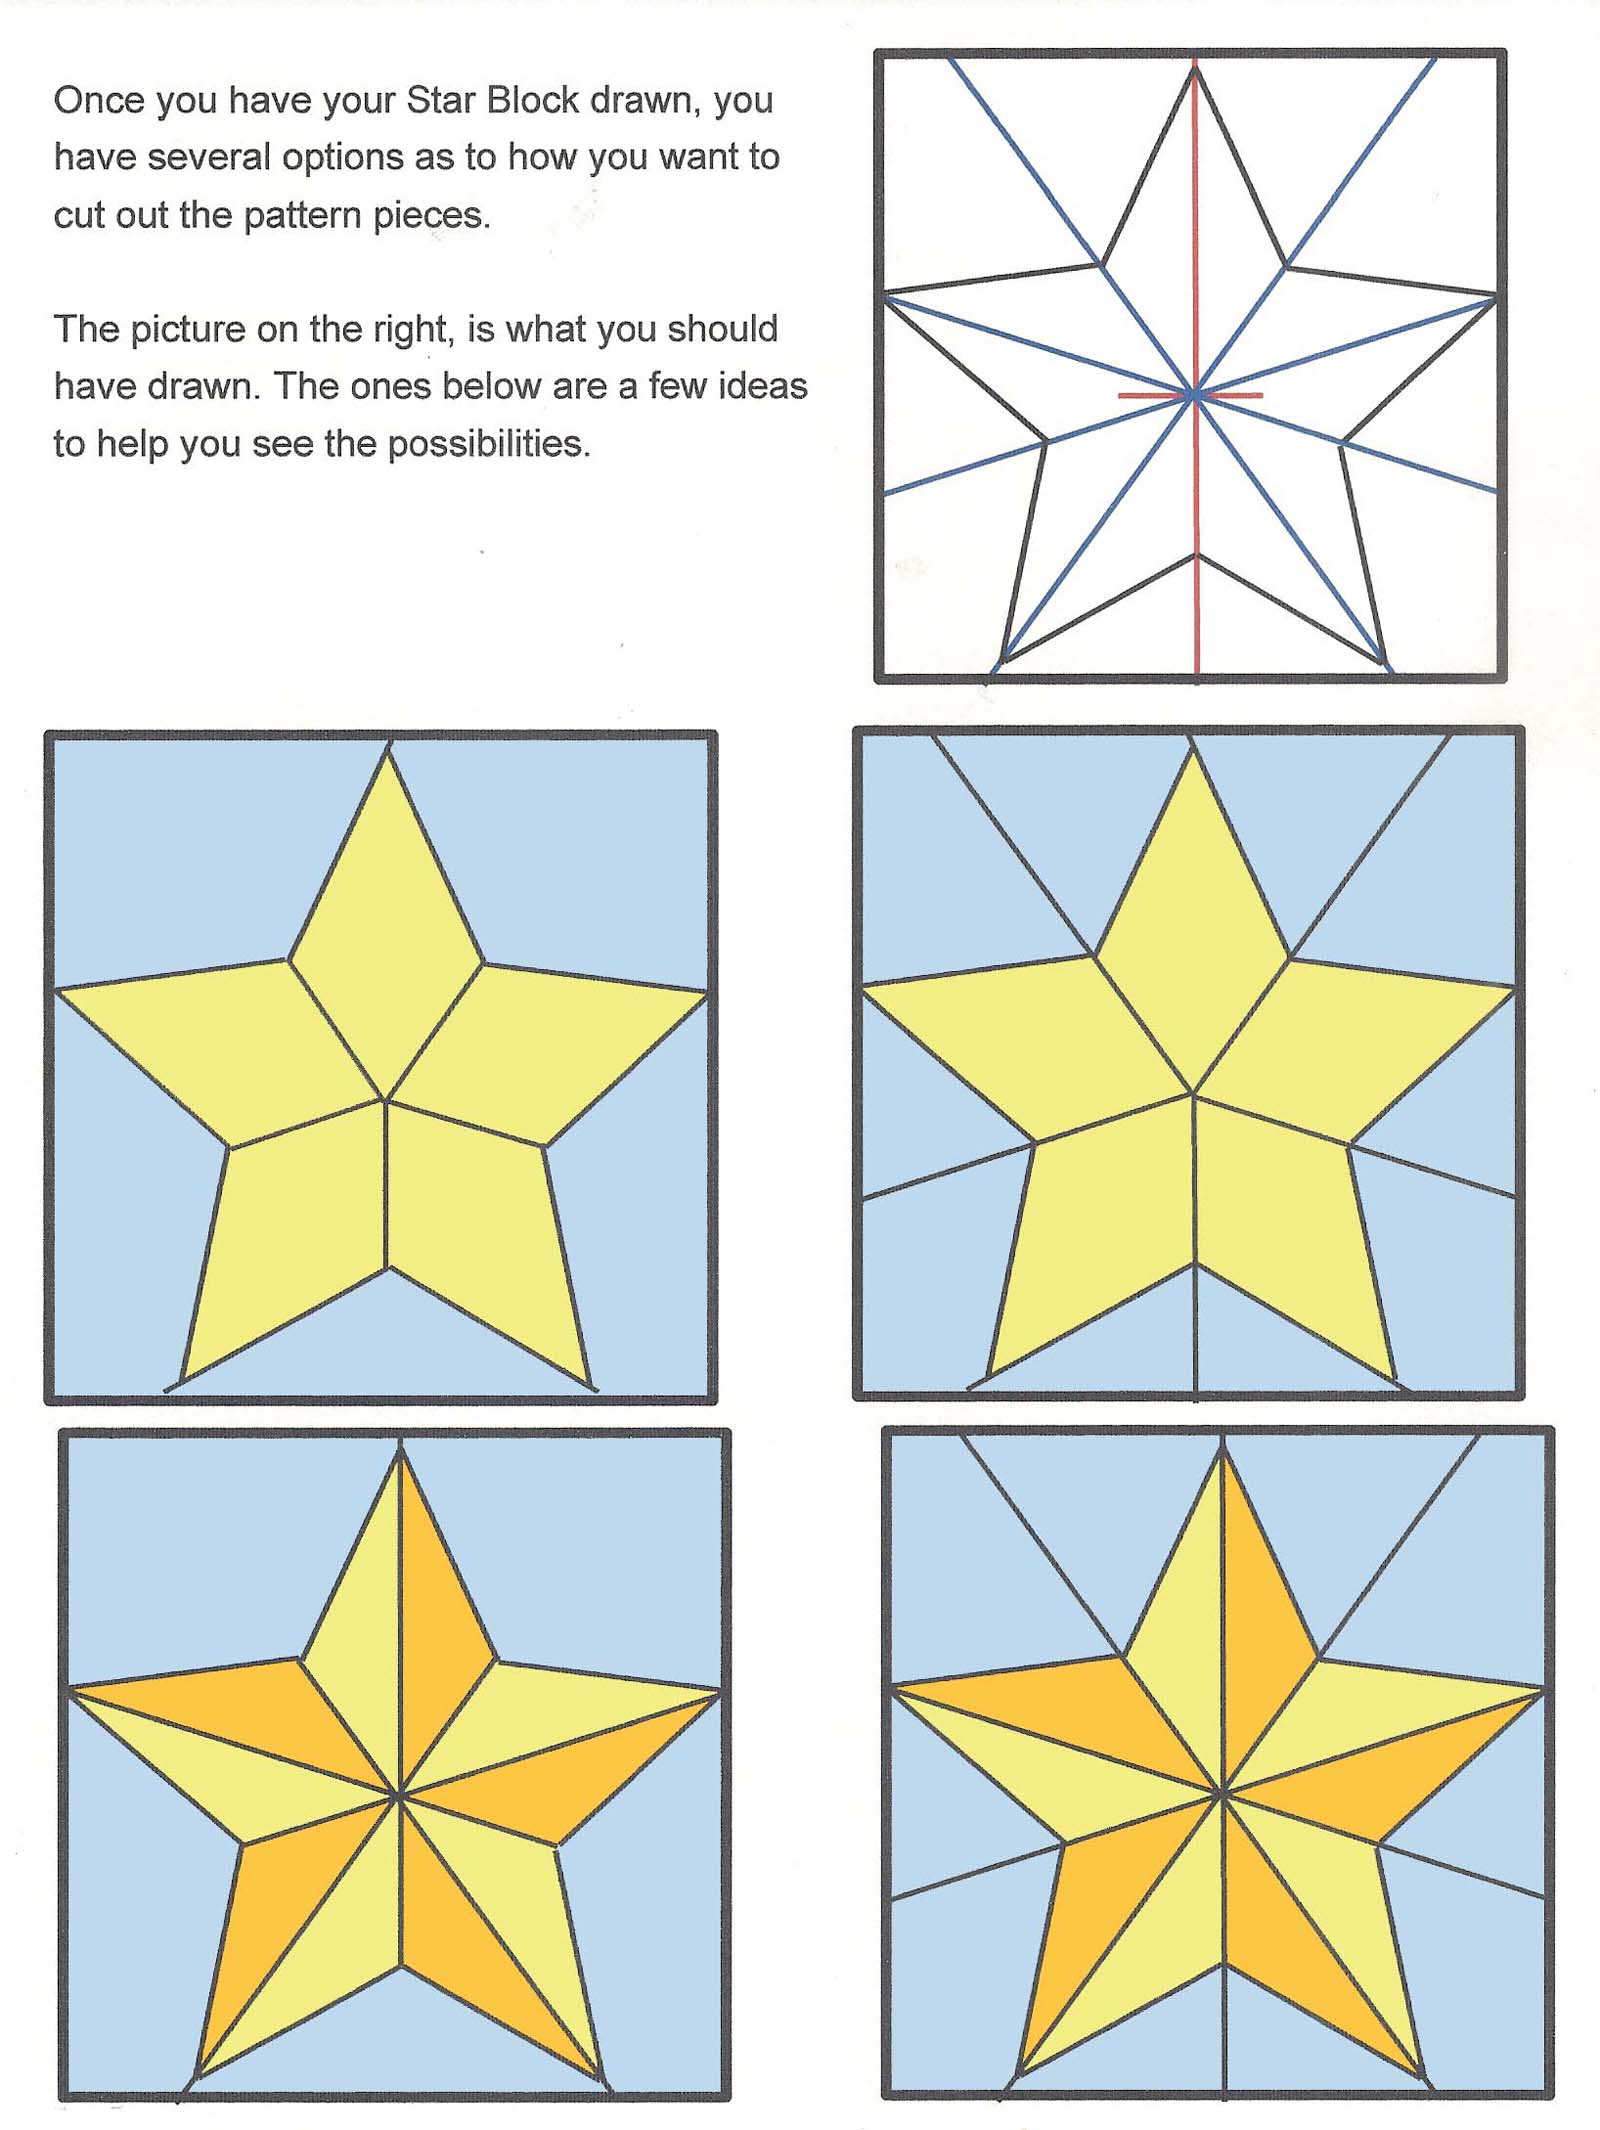 5 Point Star Block Possiblities